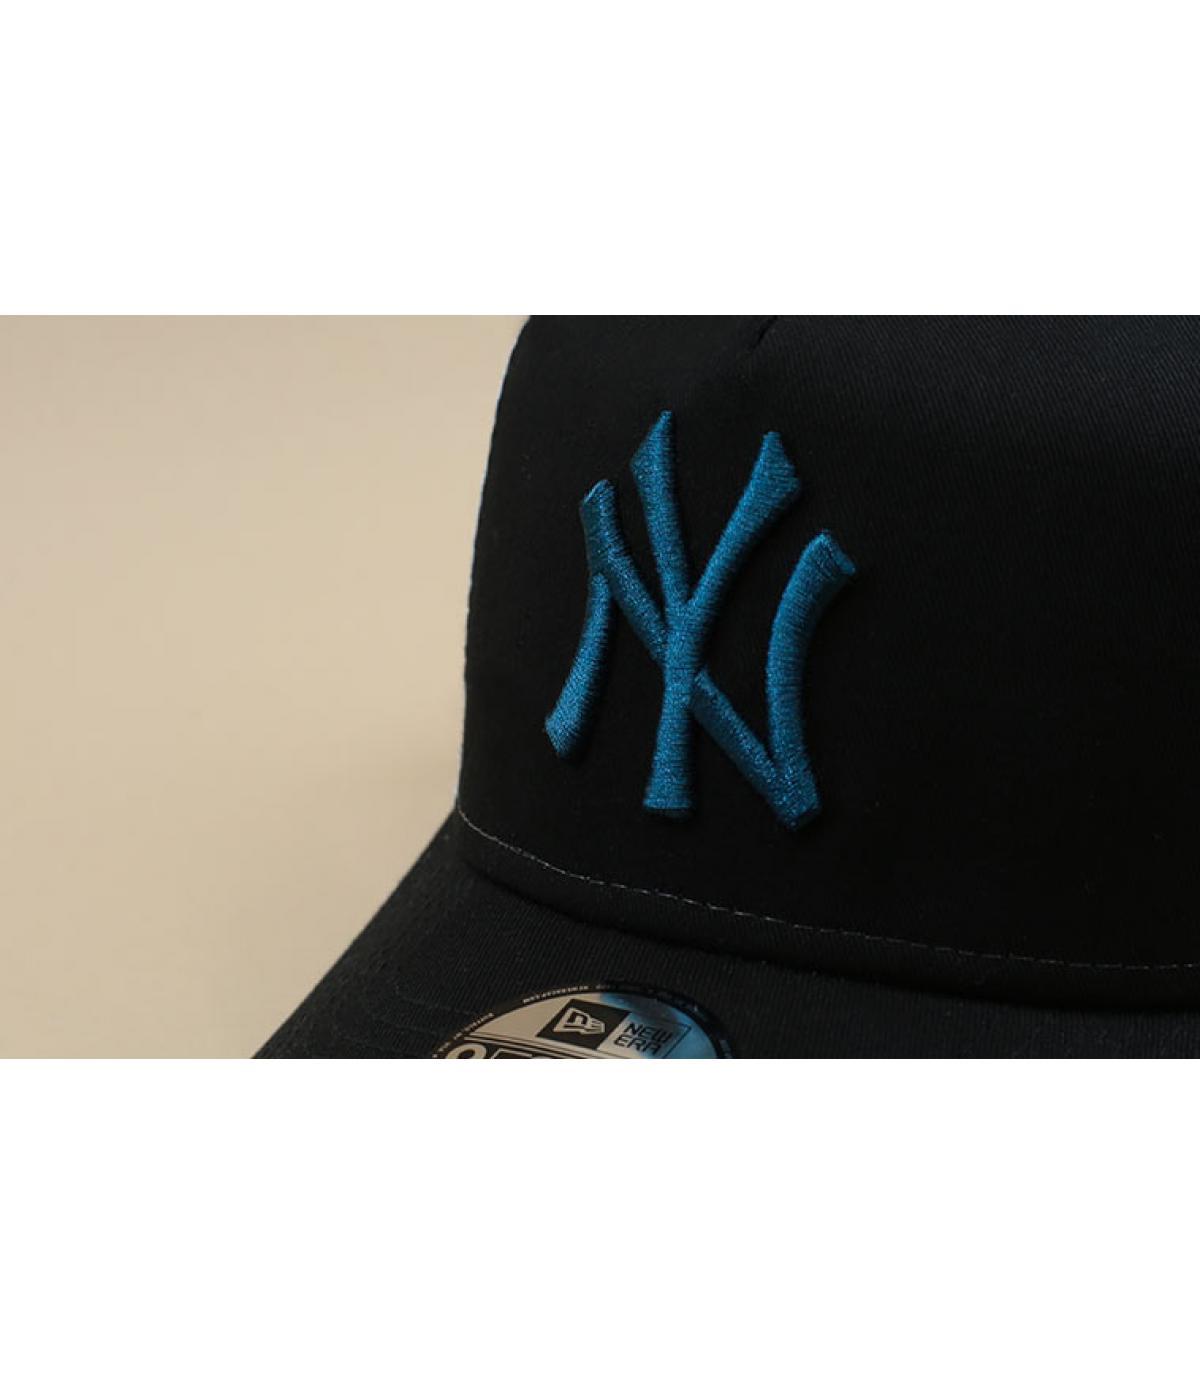 Détails Trucker Kids Ess NY black cadet blue - image 3